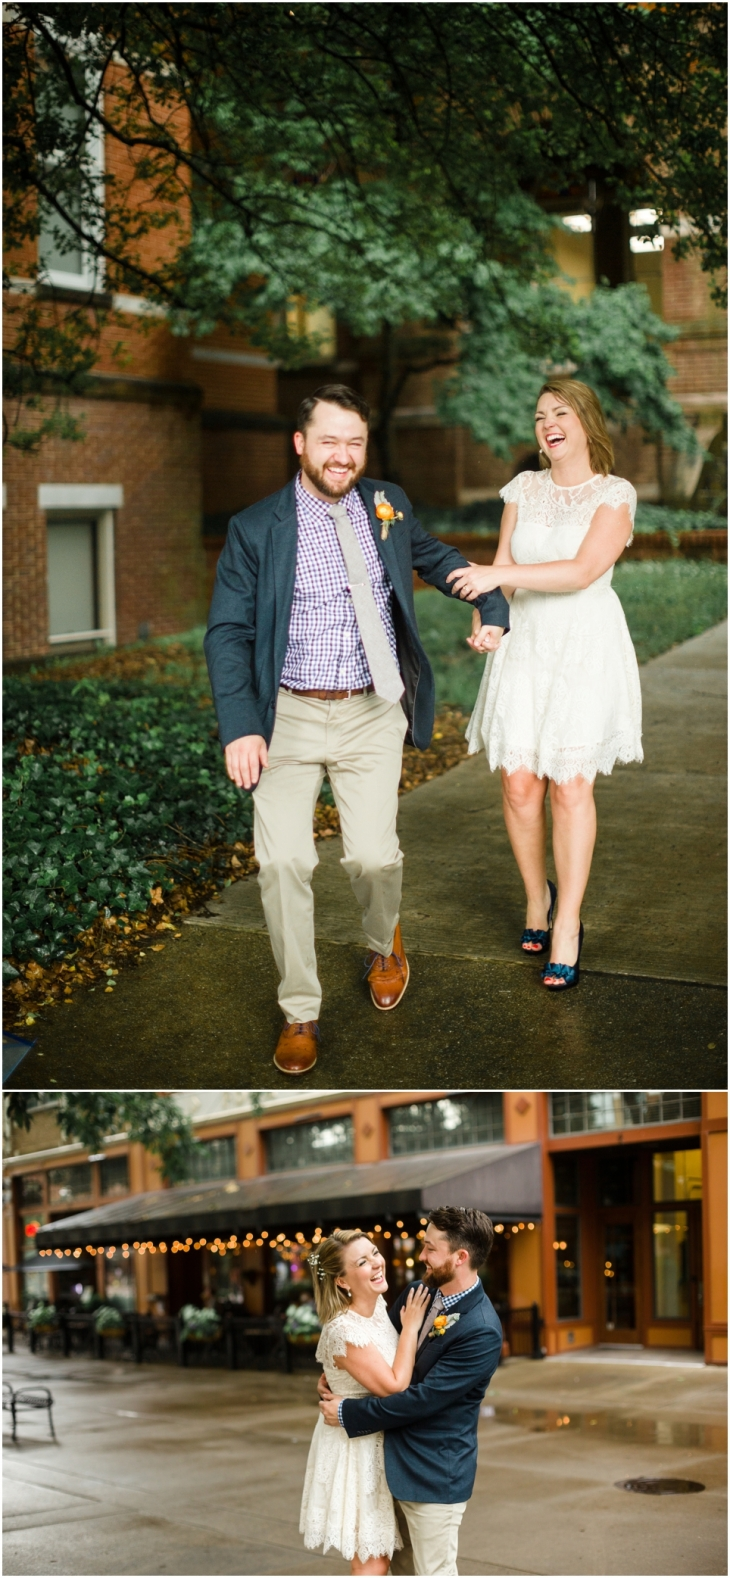 jophoto - Knoxville wedding photographer